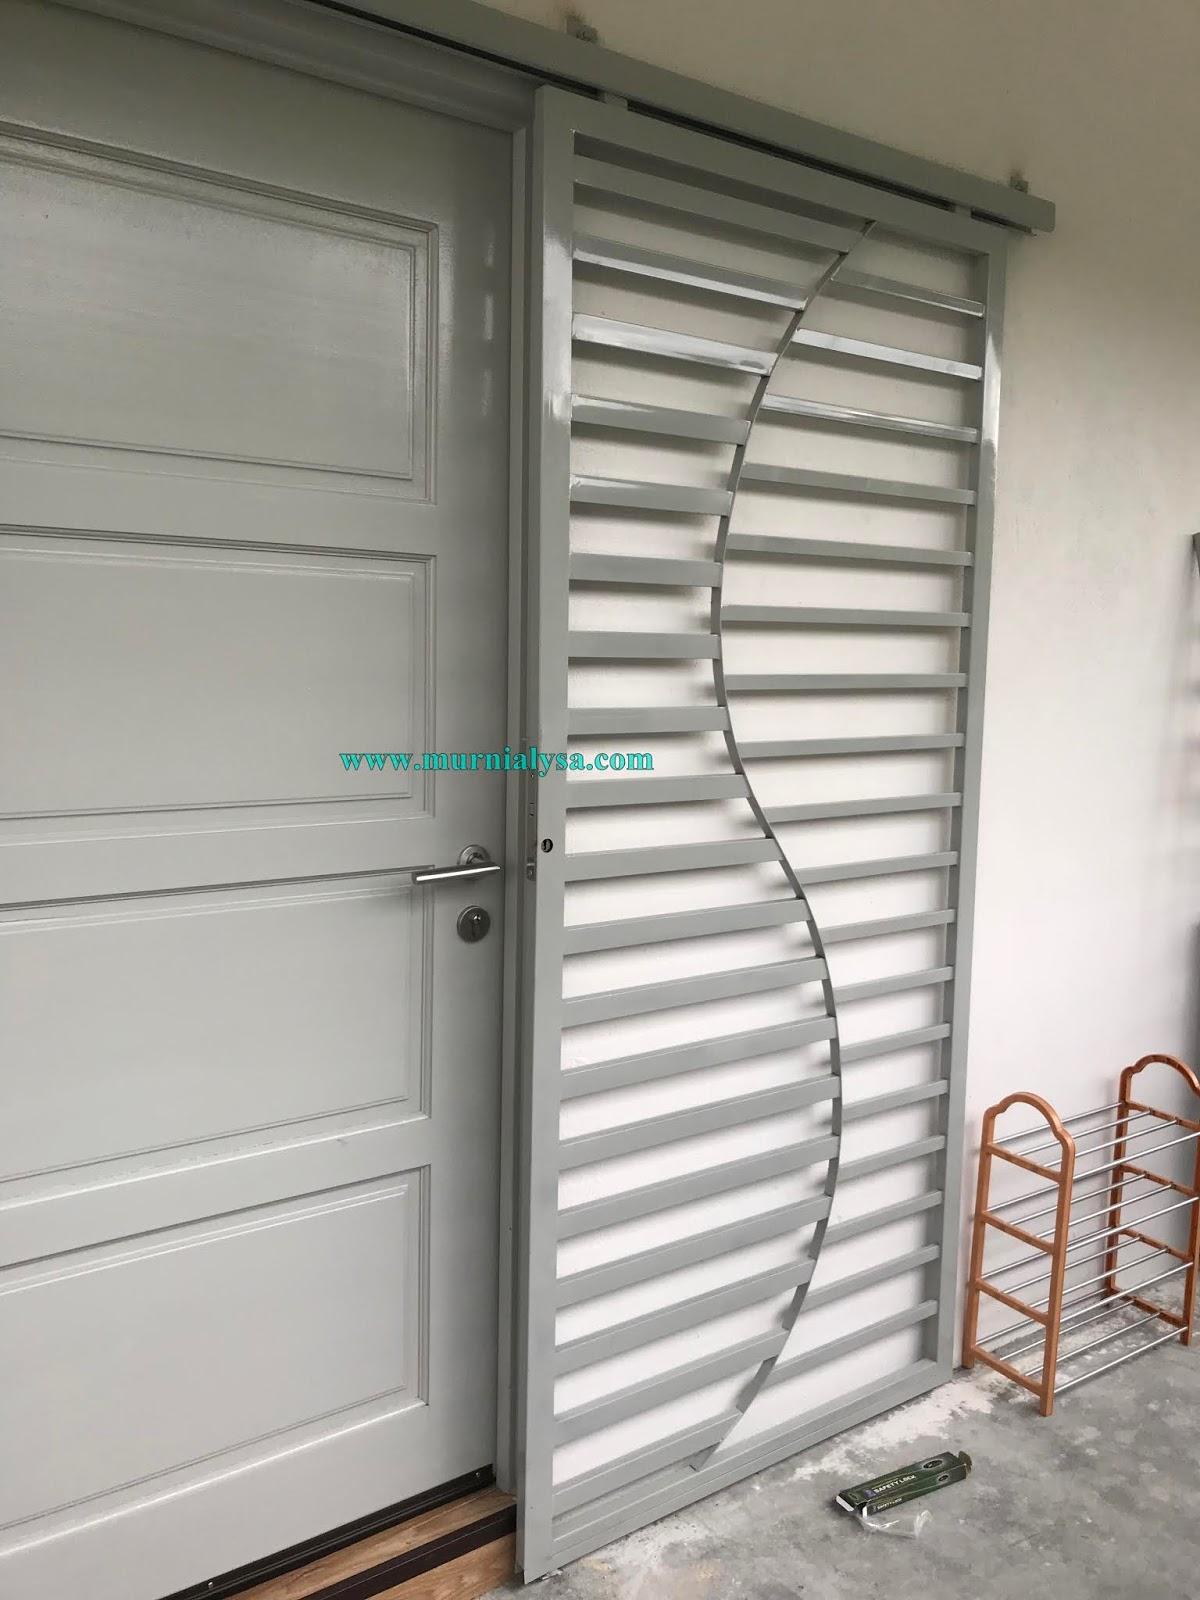 Pasang Grill Dan Bird Cage Rumah Baru Coretan Murni Alysa